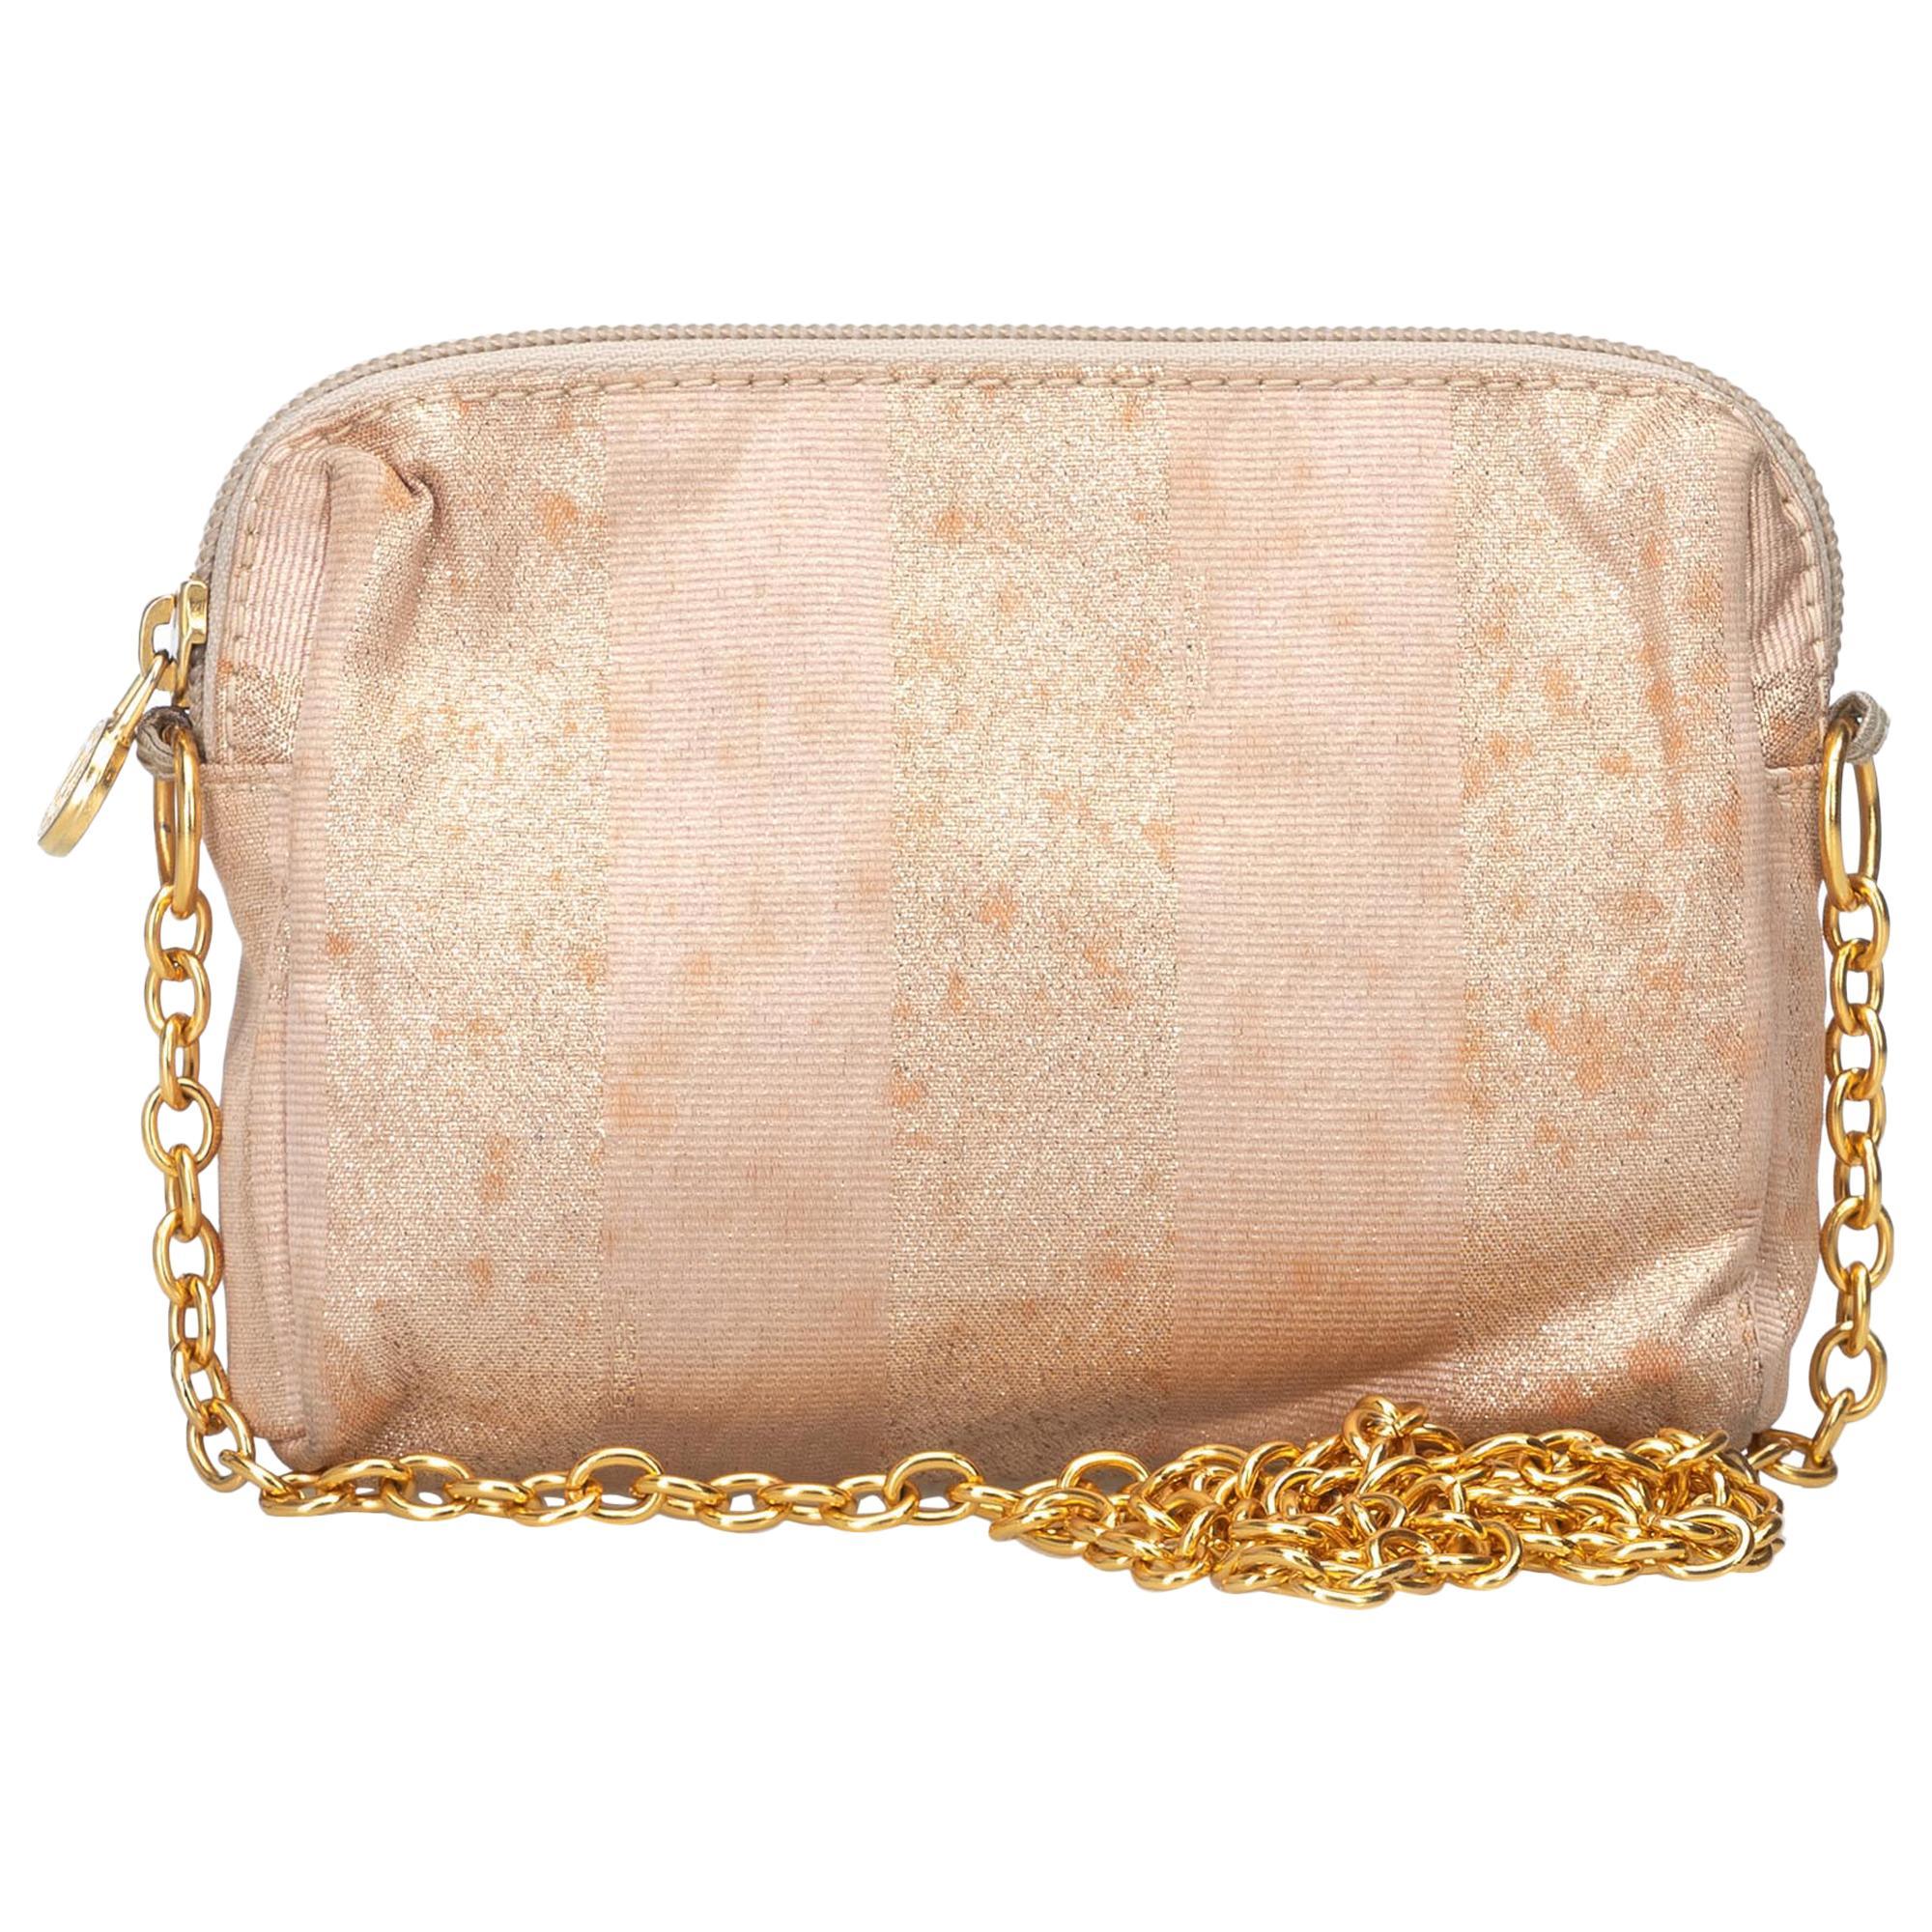 05f6da47daa Gold Crossbody Handbag